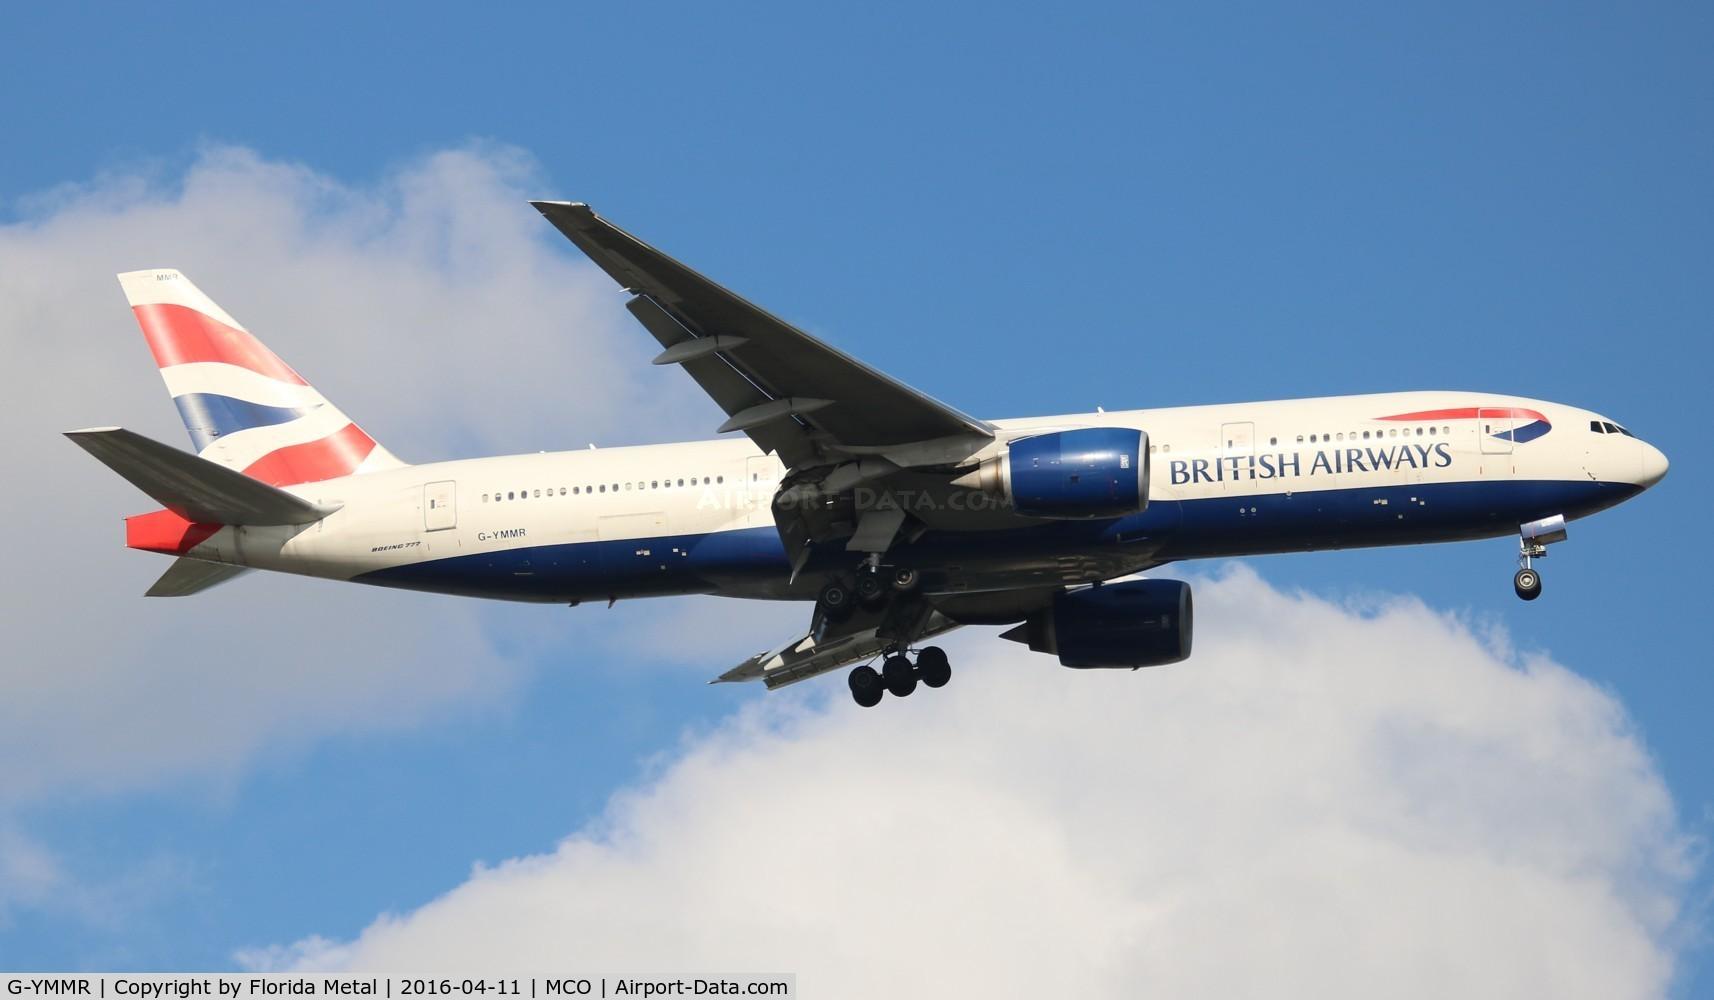 G-YMMR, 2008 Boeing 777-236 C/N 36516, British